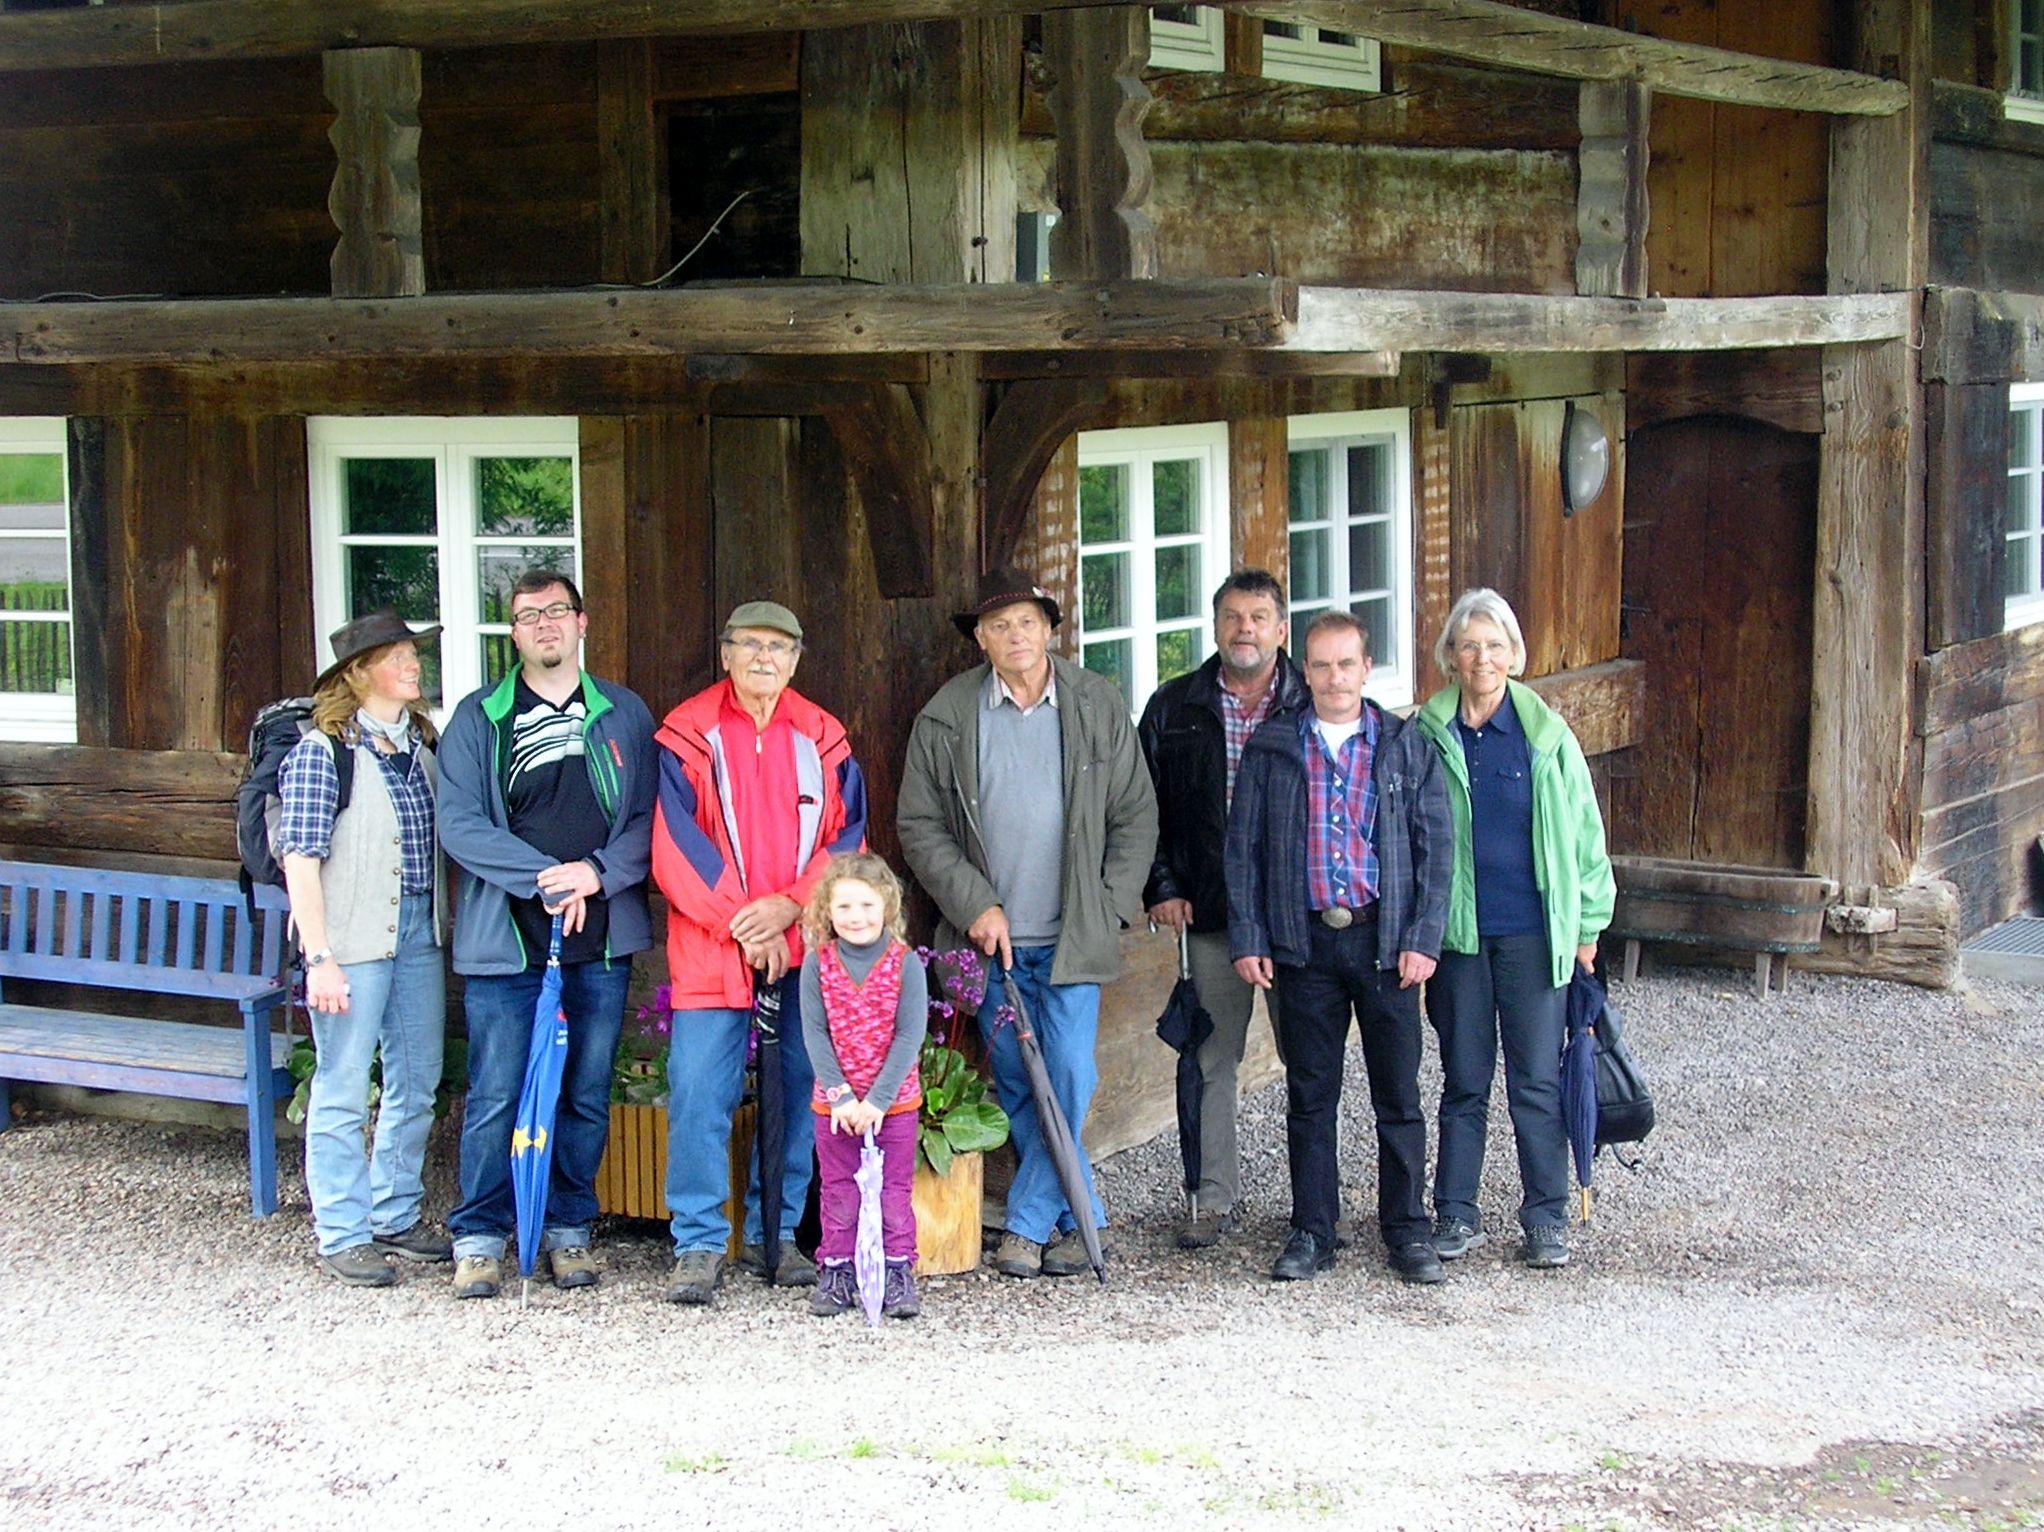 Ausflug der aktiven nach Buchenbach